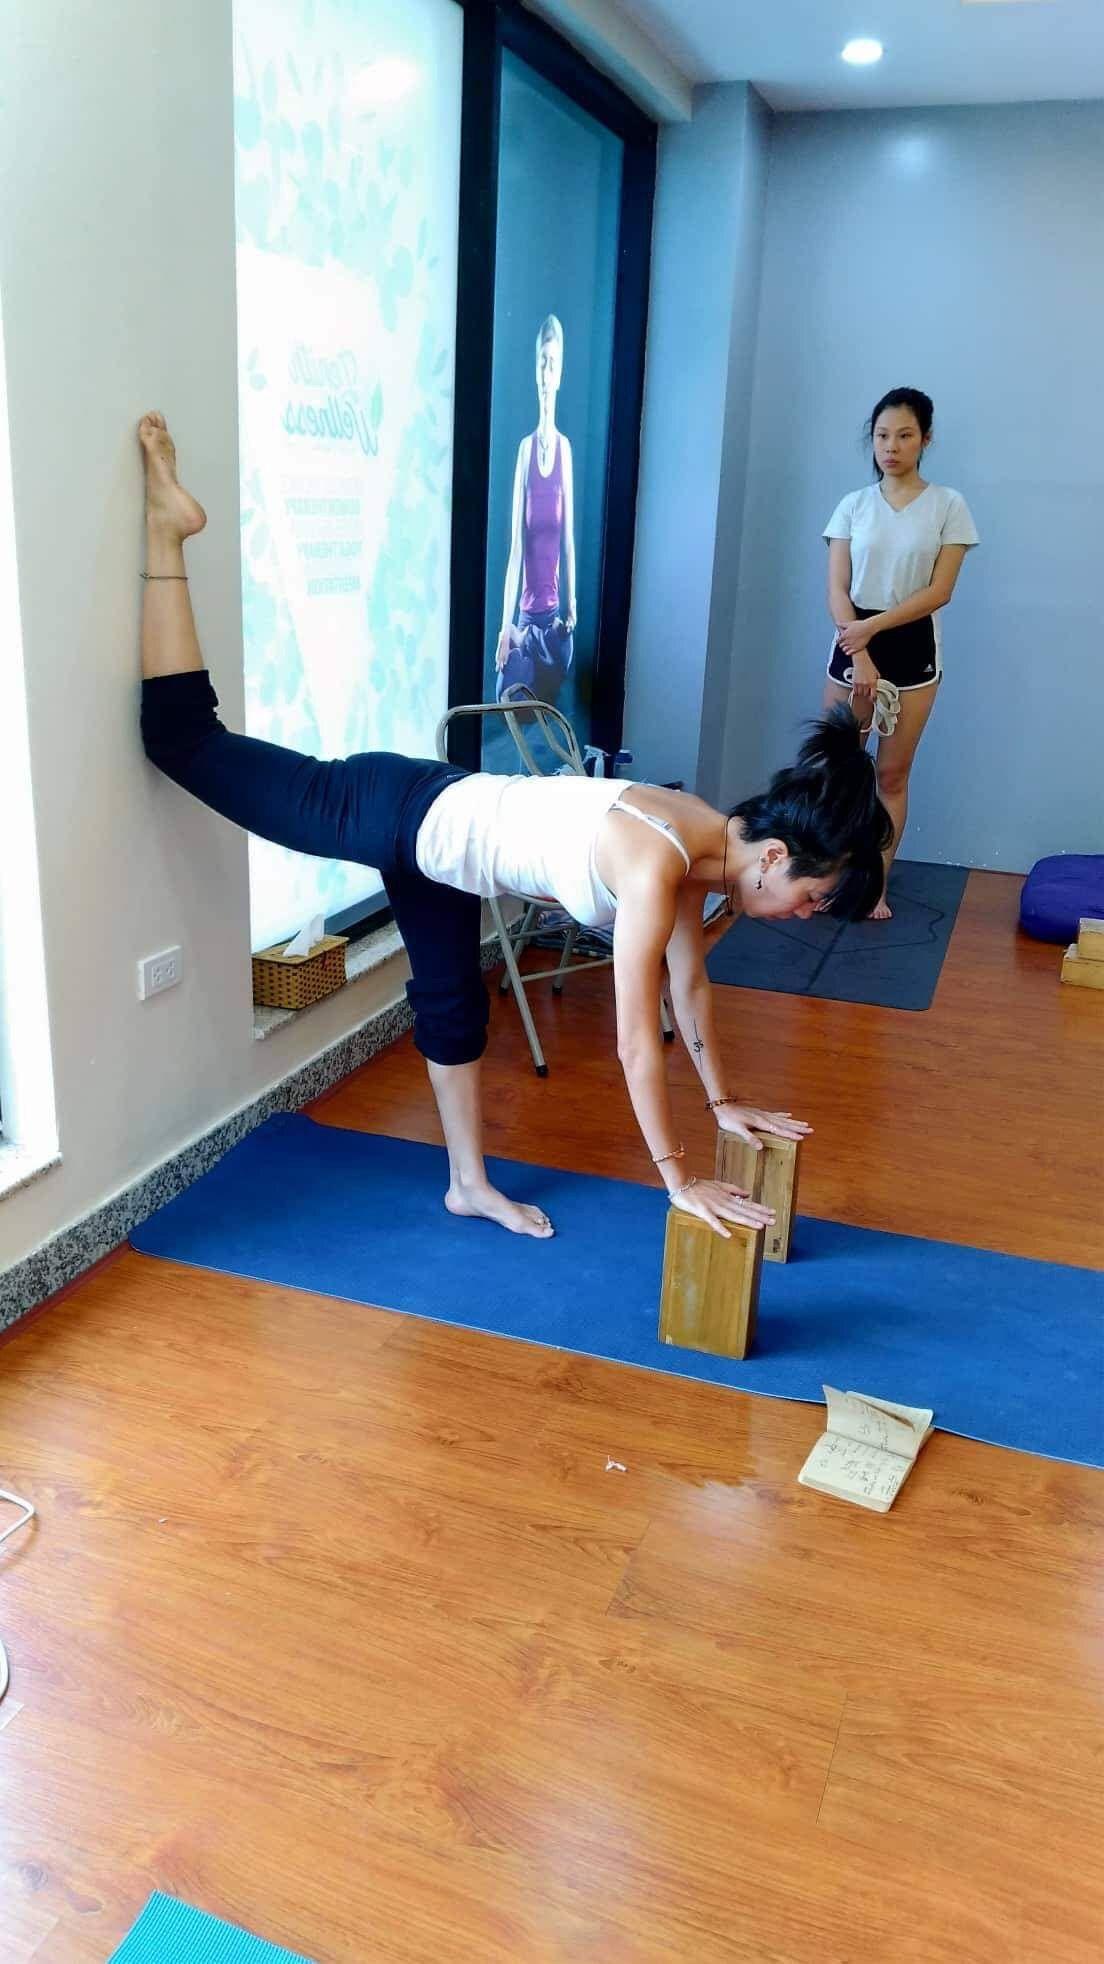 Pin by Thuy Nguyen on Yoga | Wall yoga, Yoga moves ...